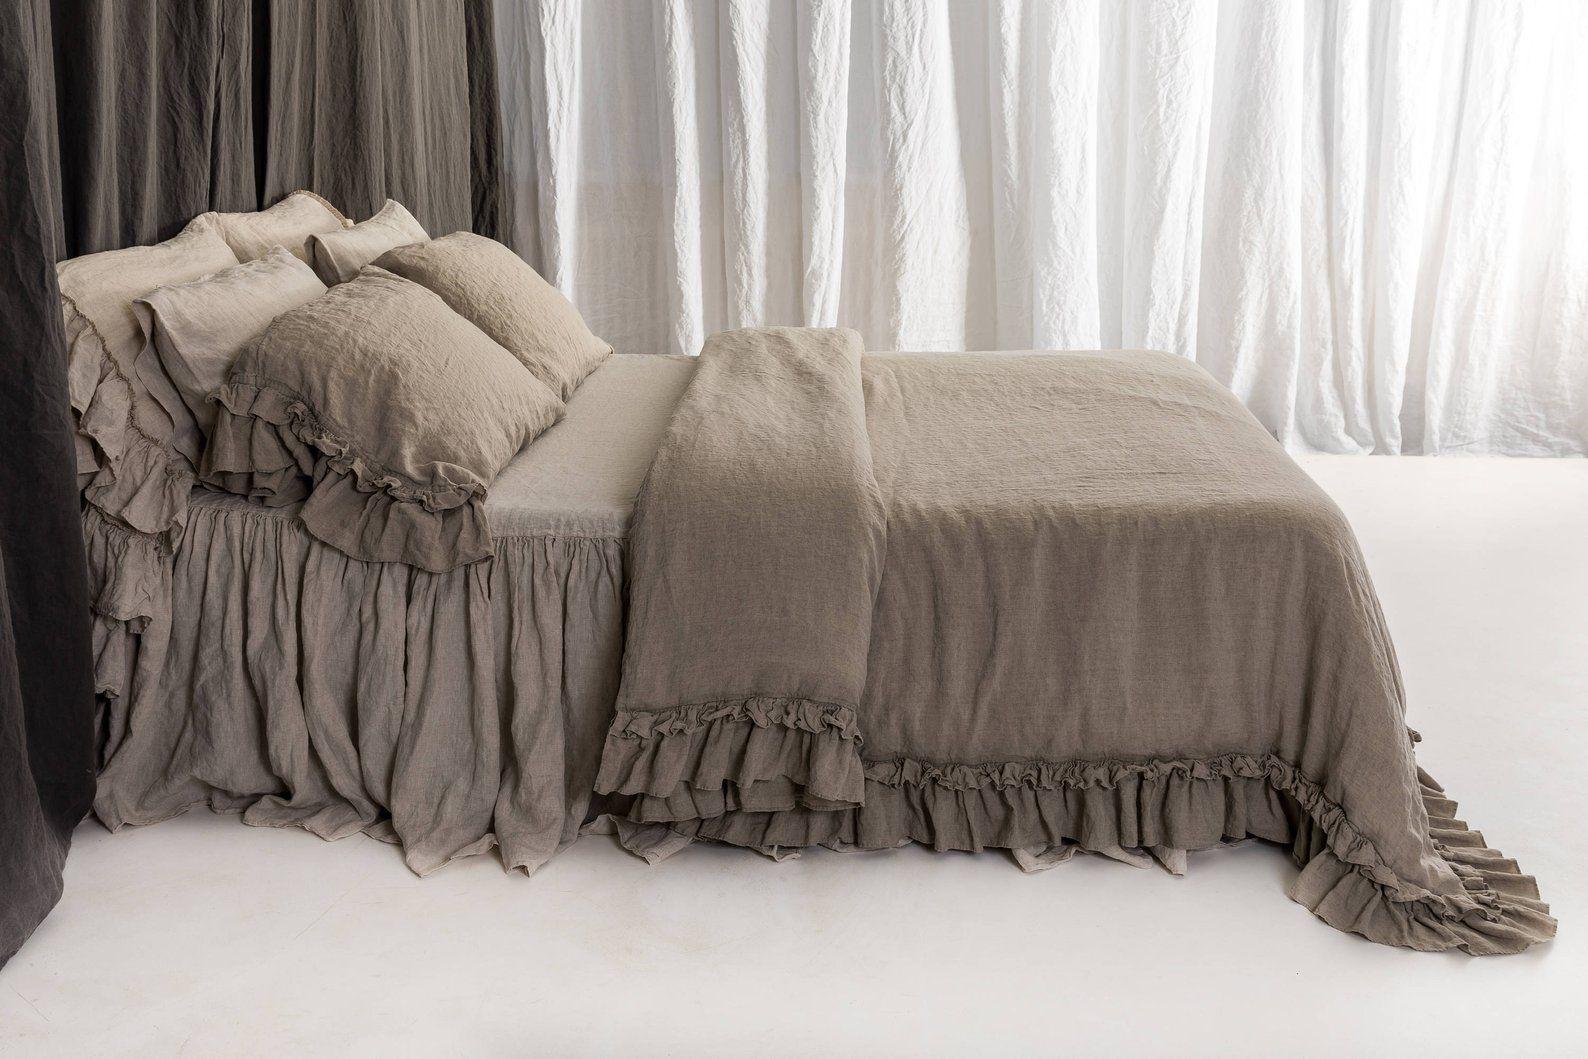 Linen Duvet Cover Set Rustic Style Linen Bedding With Double Etsy Linen Duvet Covers Ruffle Duvet Cover Duvet Cover Sets